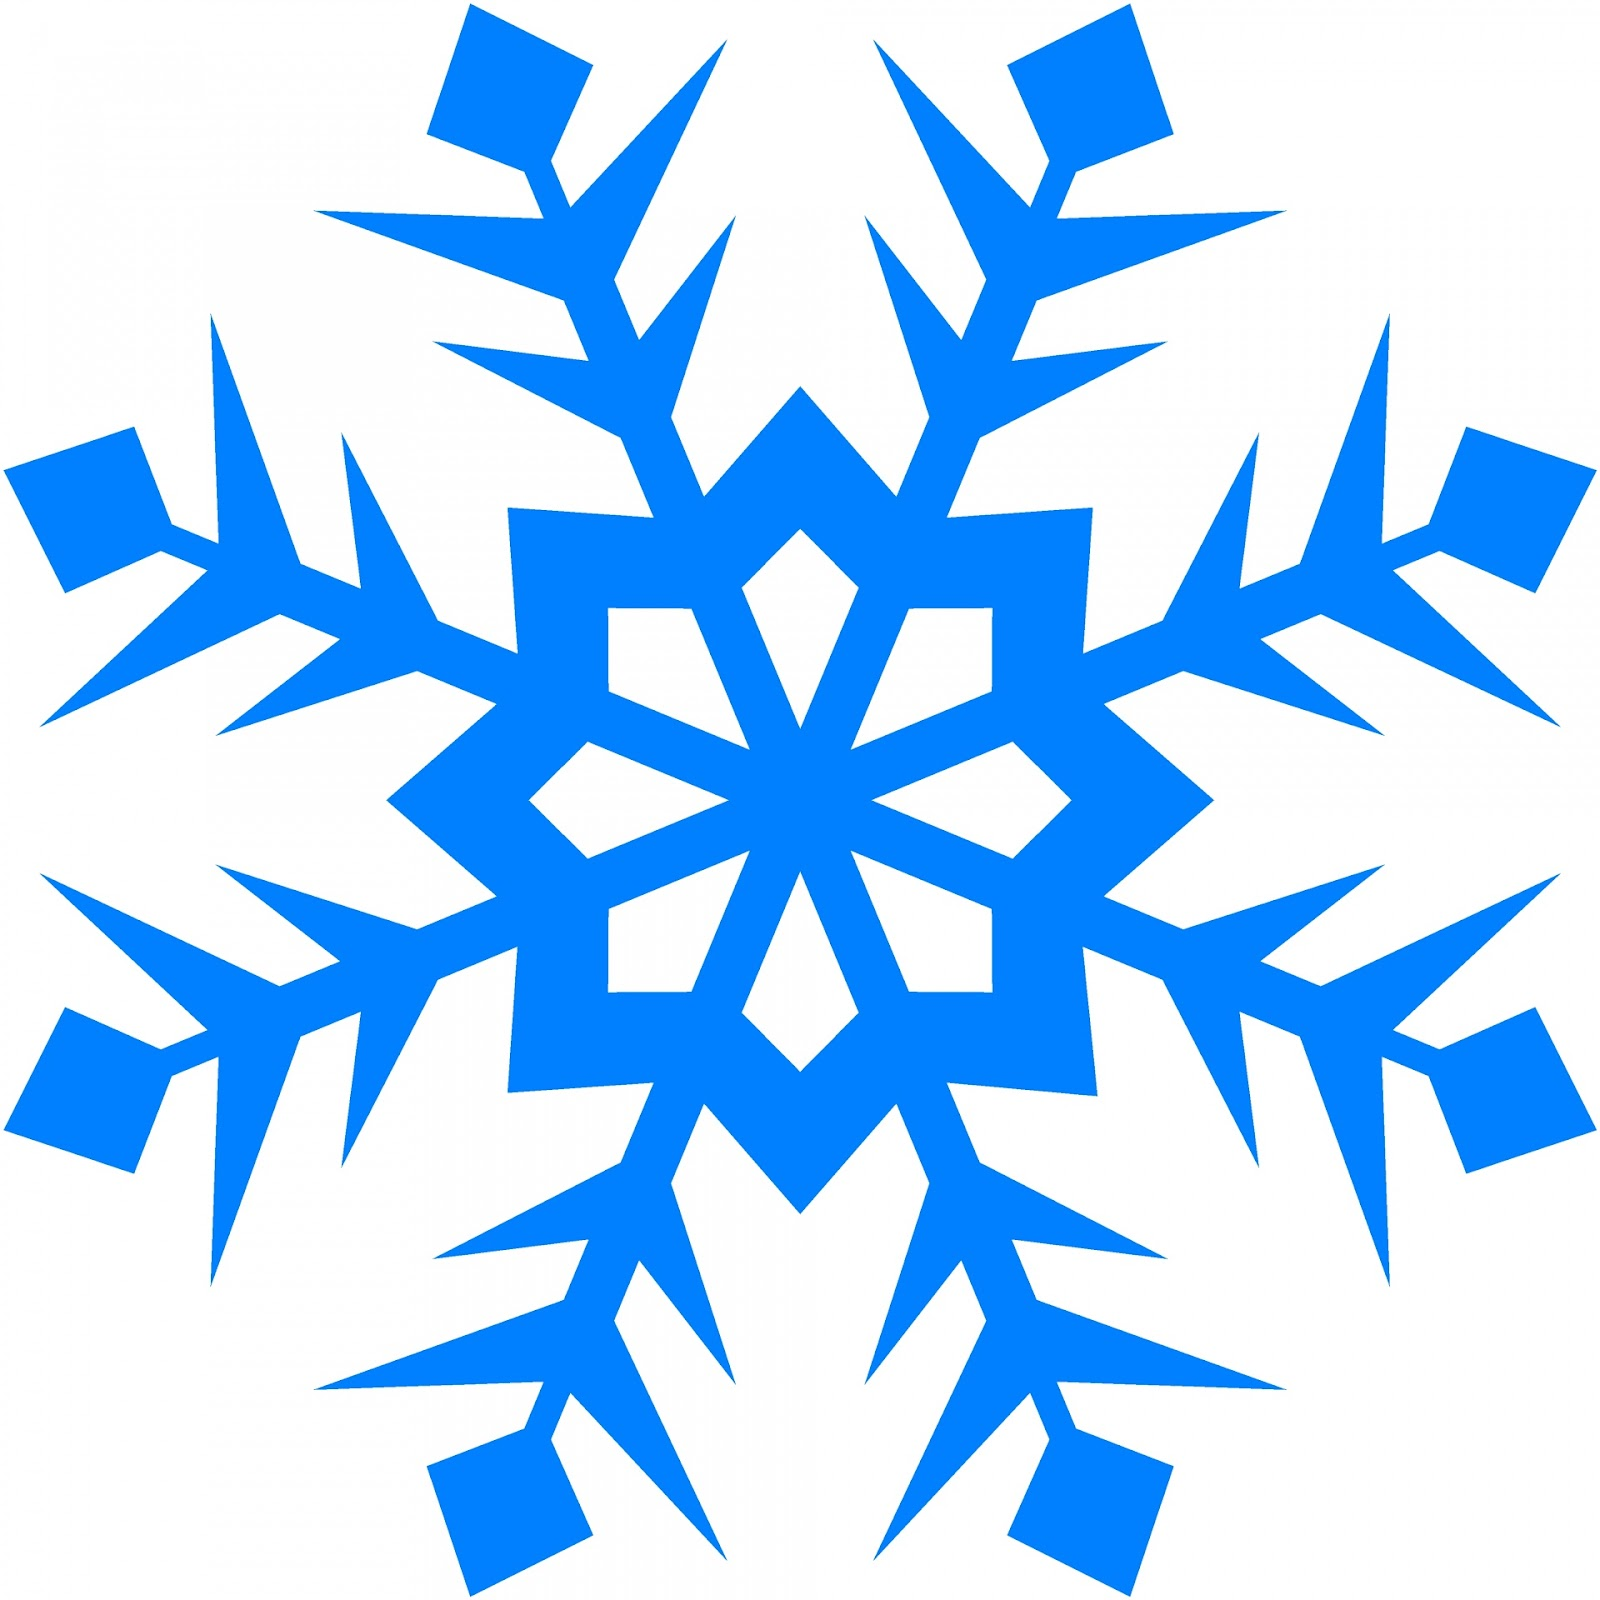 ... Blue Snowflake 99 ...